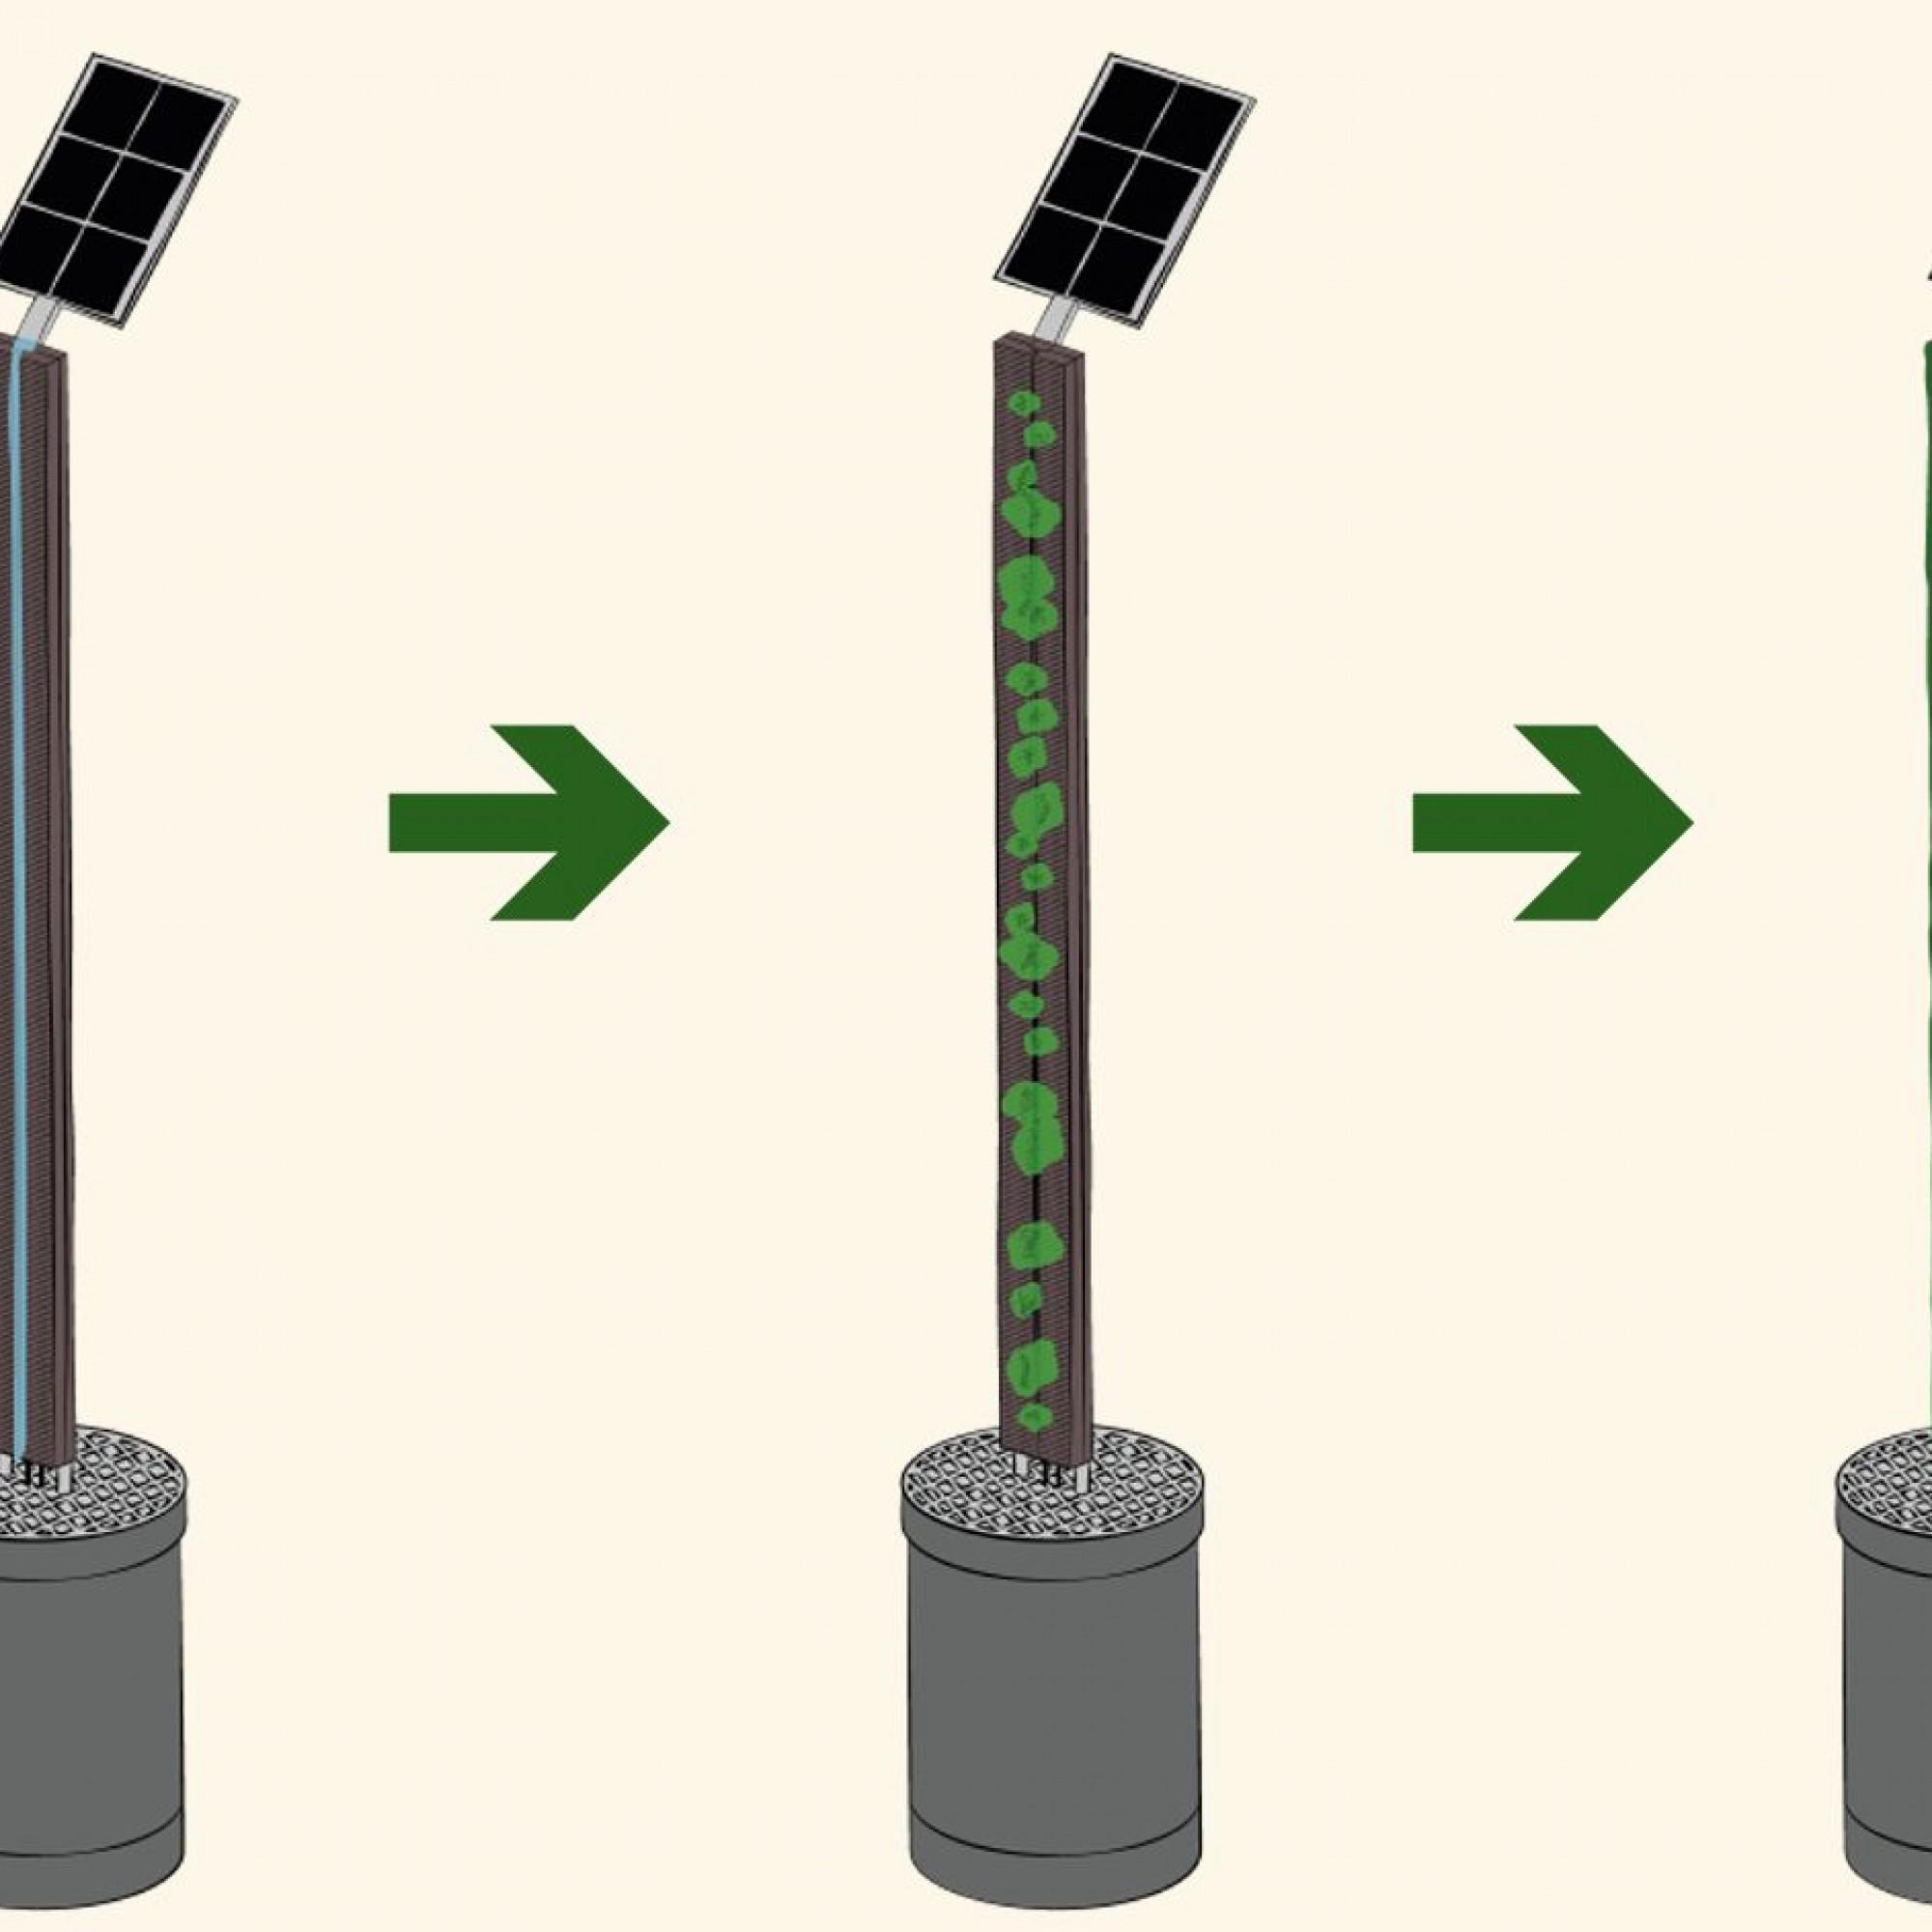 Illustration des selbstbegrünenden Bauelements. (Quelle:artificial-ecosystems.com)